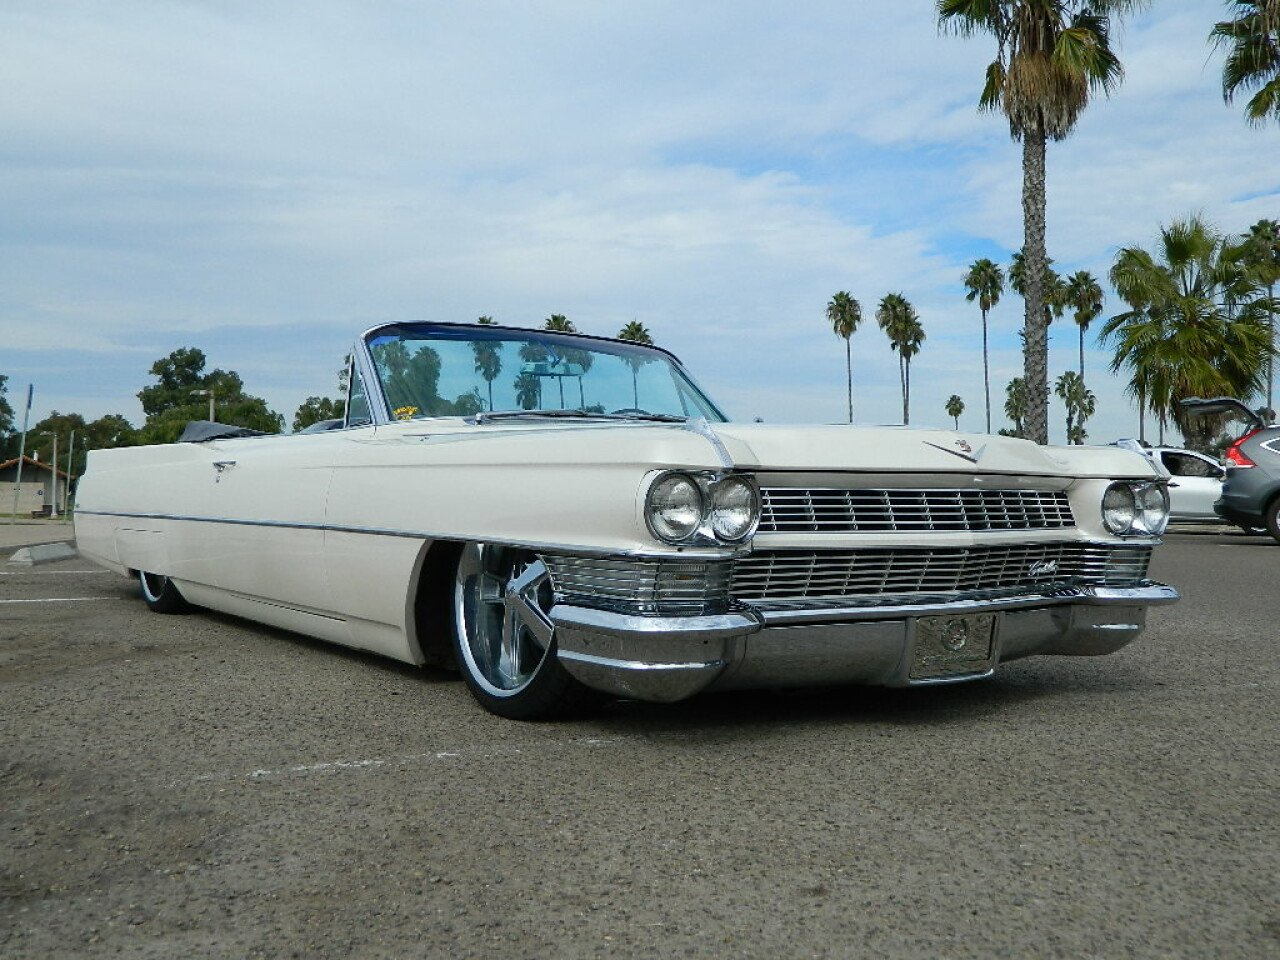 Classic Cars For Sale California Usa: 1964 Cadillac De Ville For Sale Near Orange, California